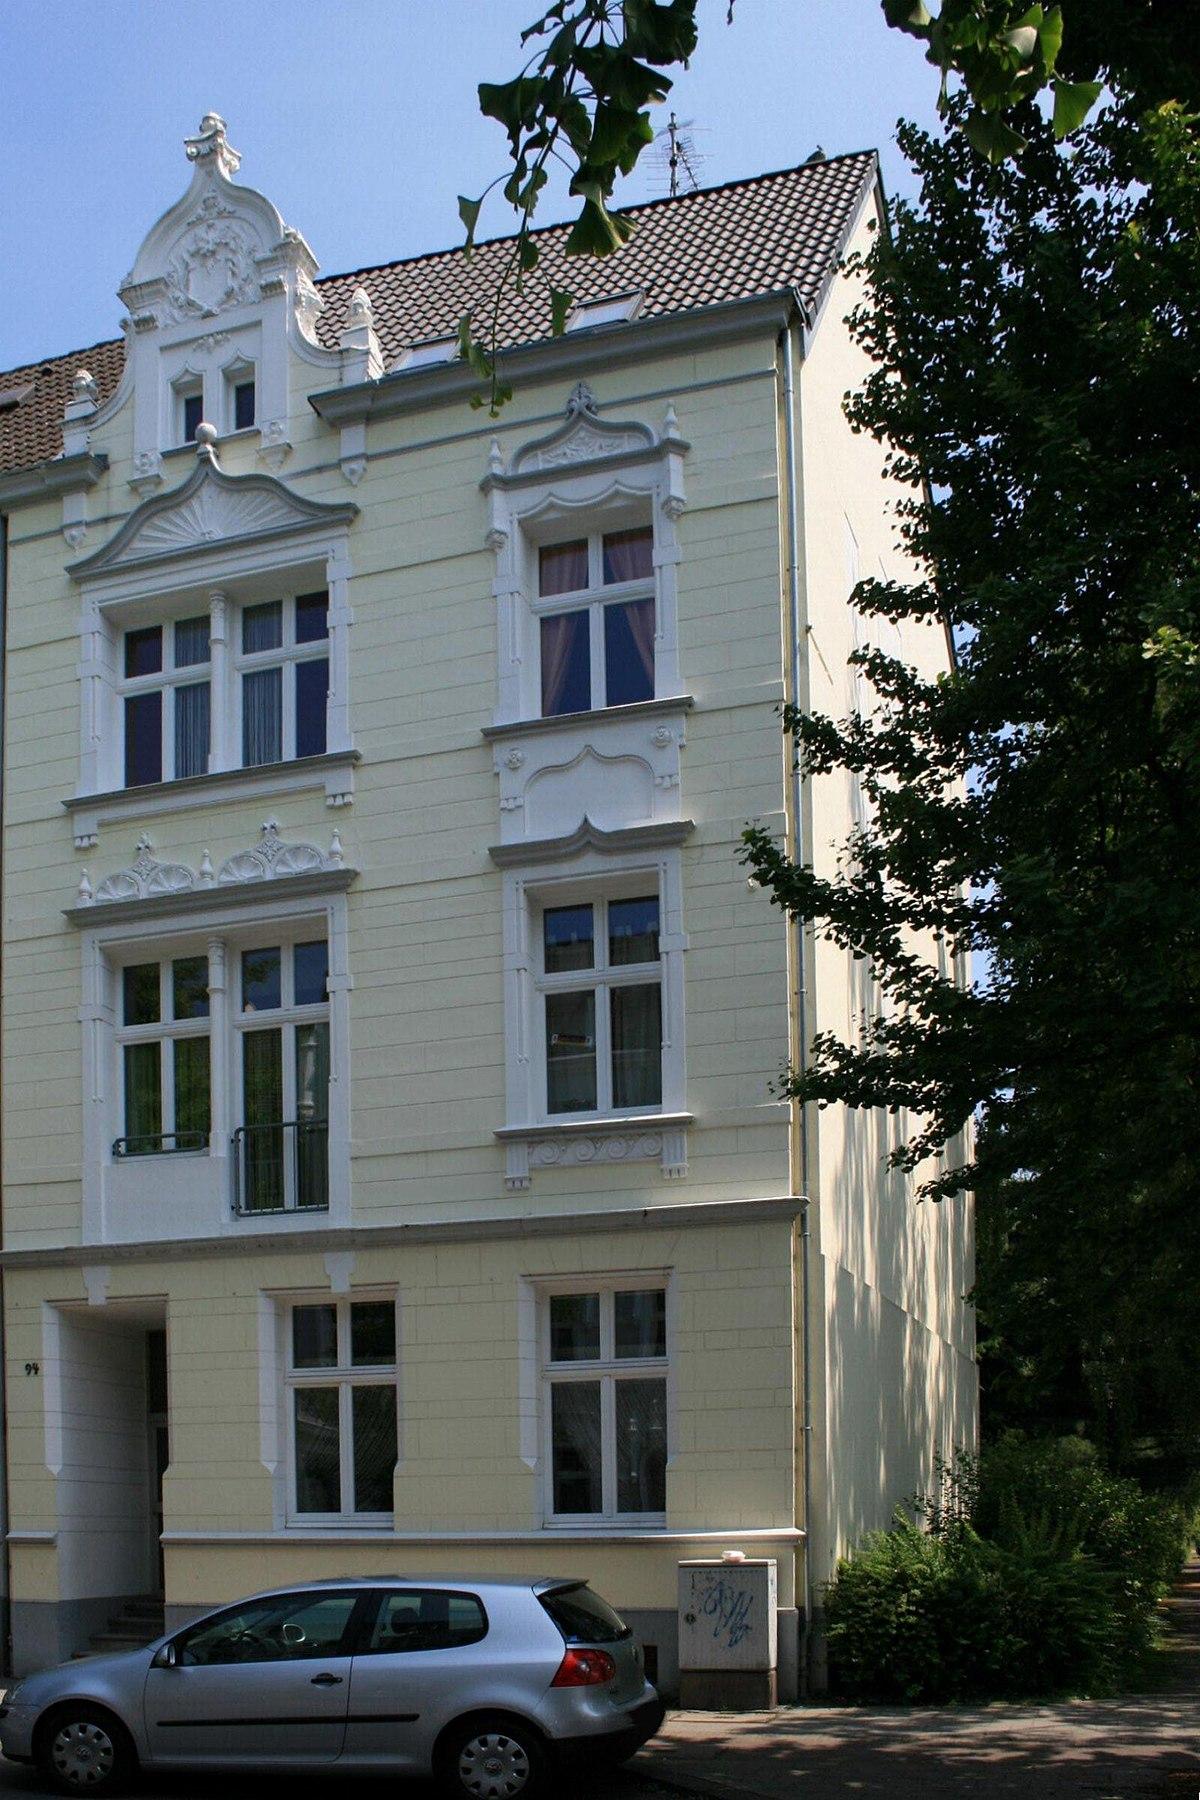 Fenster M Nchengladbach brucknerallee 94 mönchengladbach